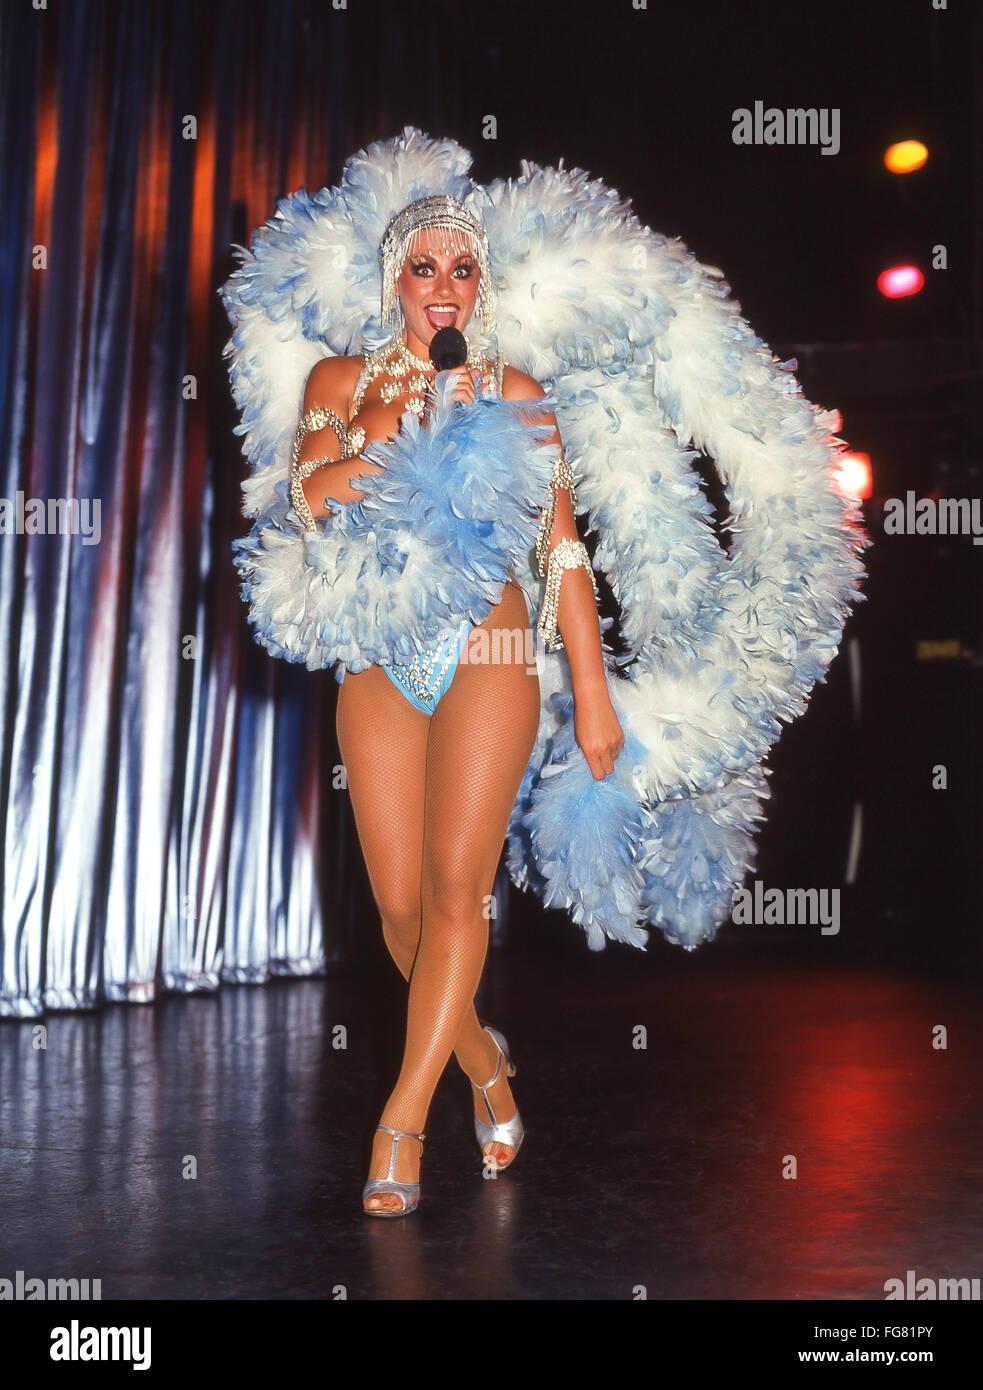 Showgirl dancer at Benidorm Palace Nightclub, Avenida Severo Ochoa, Benidorm, Costa Blanca, Alicante Province, Spain - Stock Image